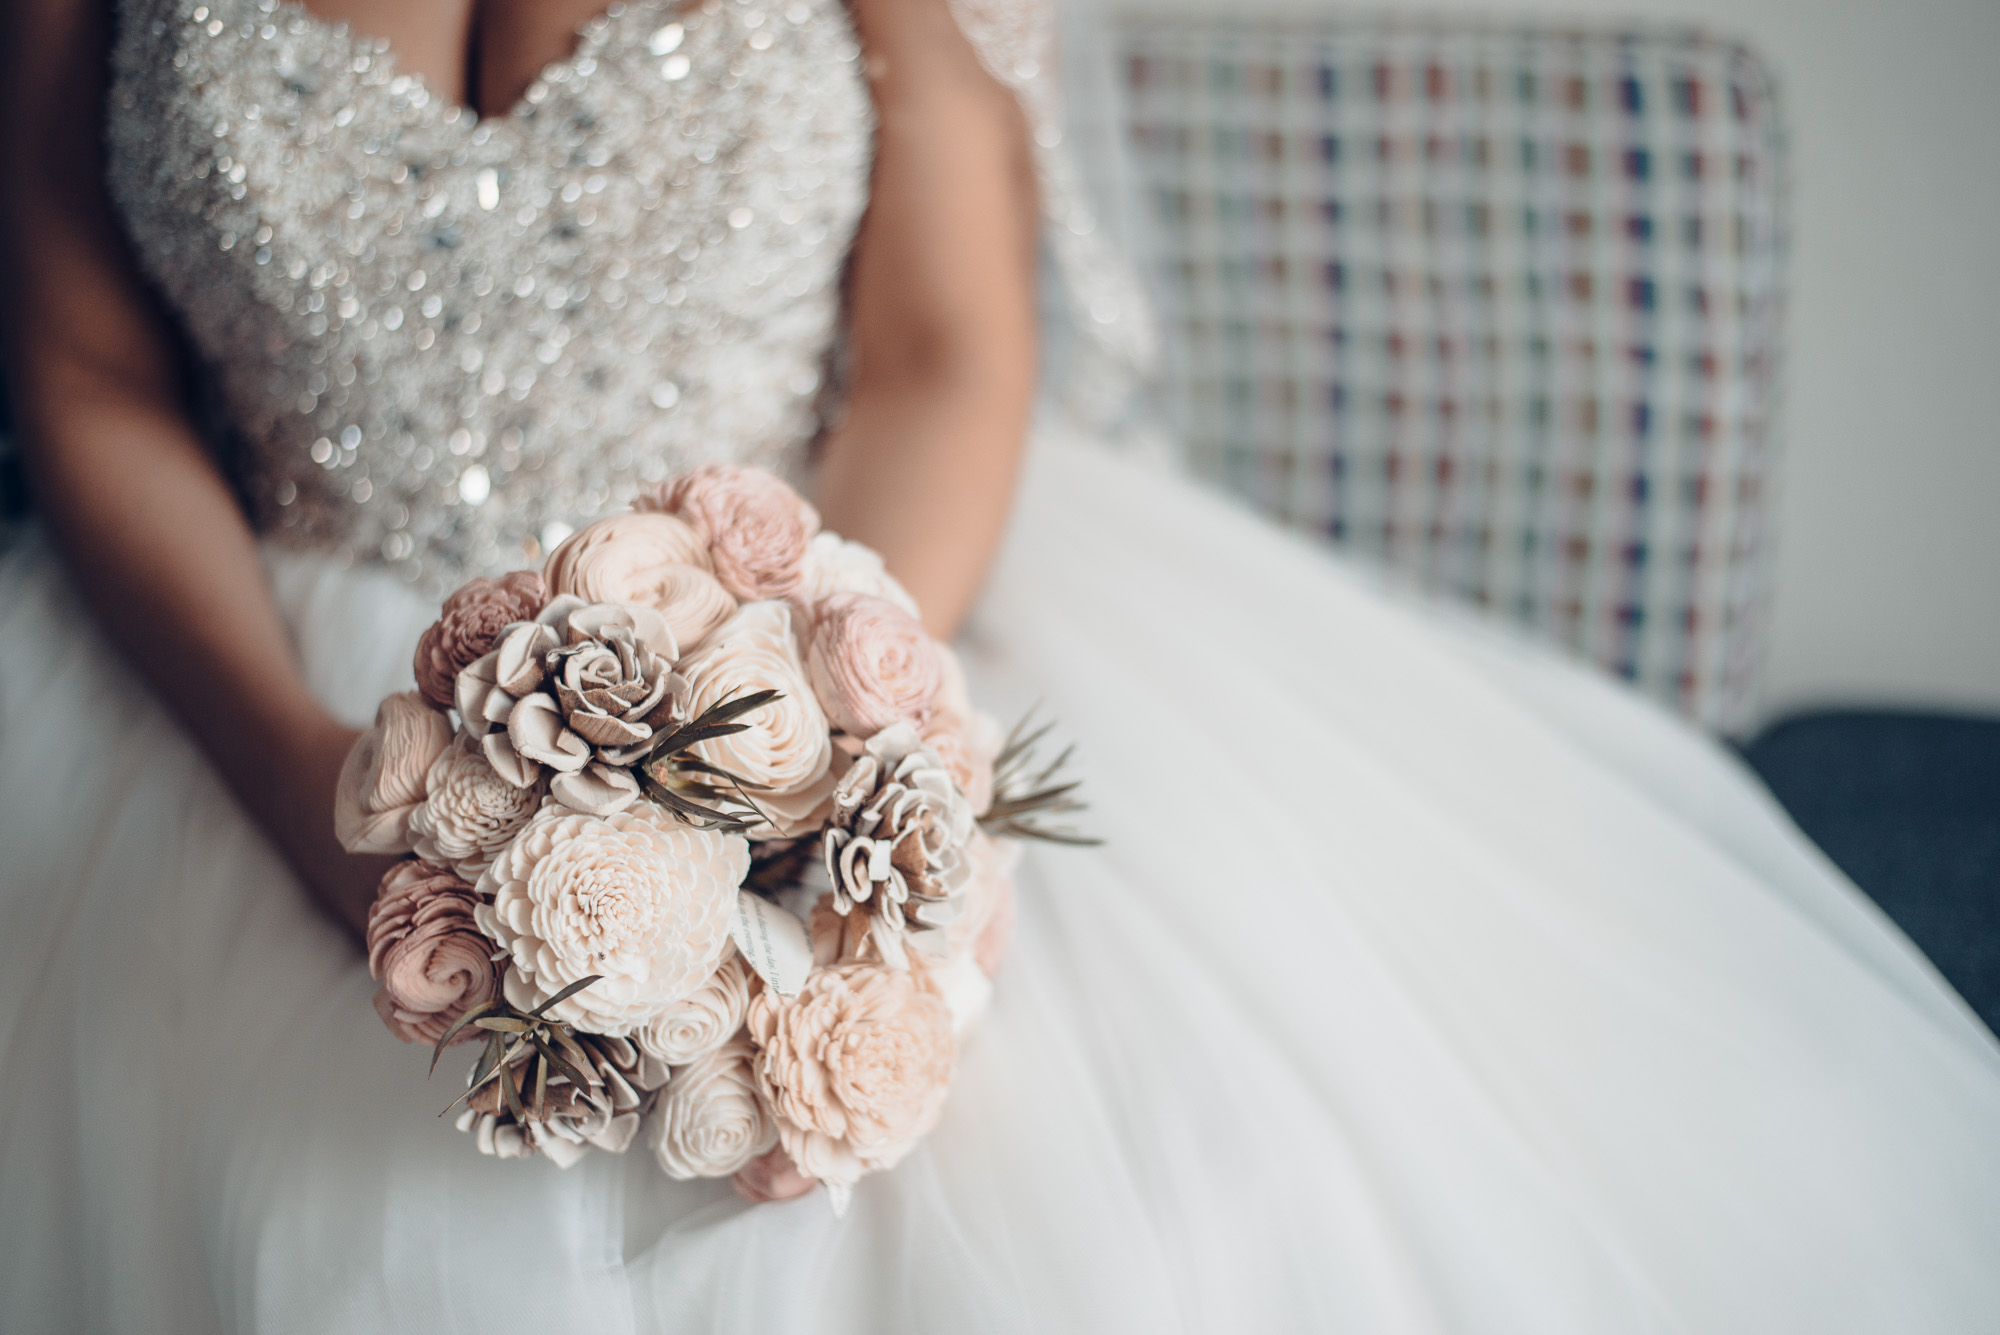 woodwinds_wedding_171020_web-18.jpg